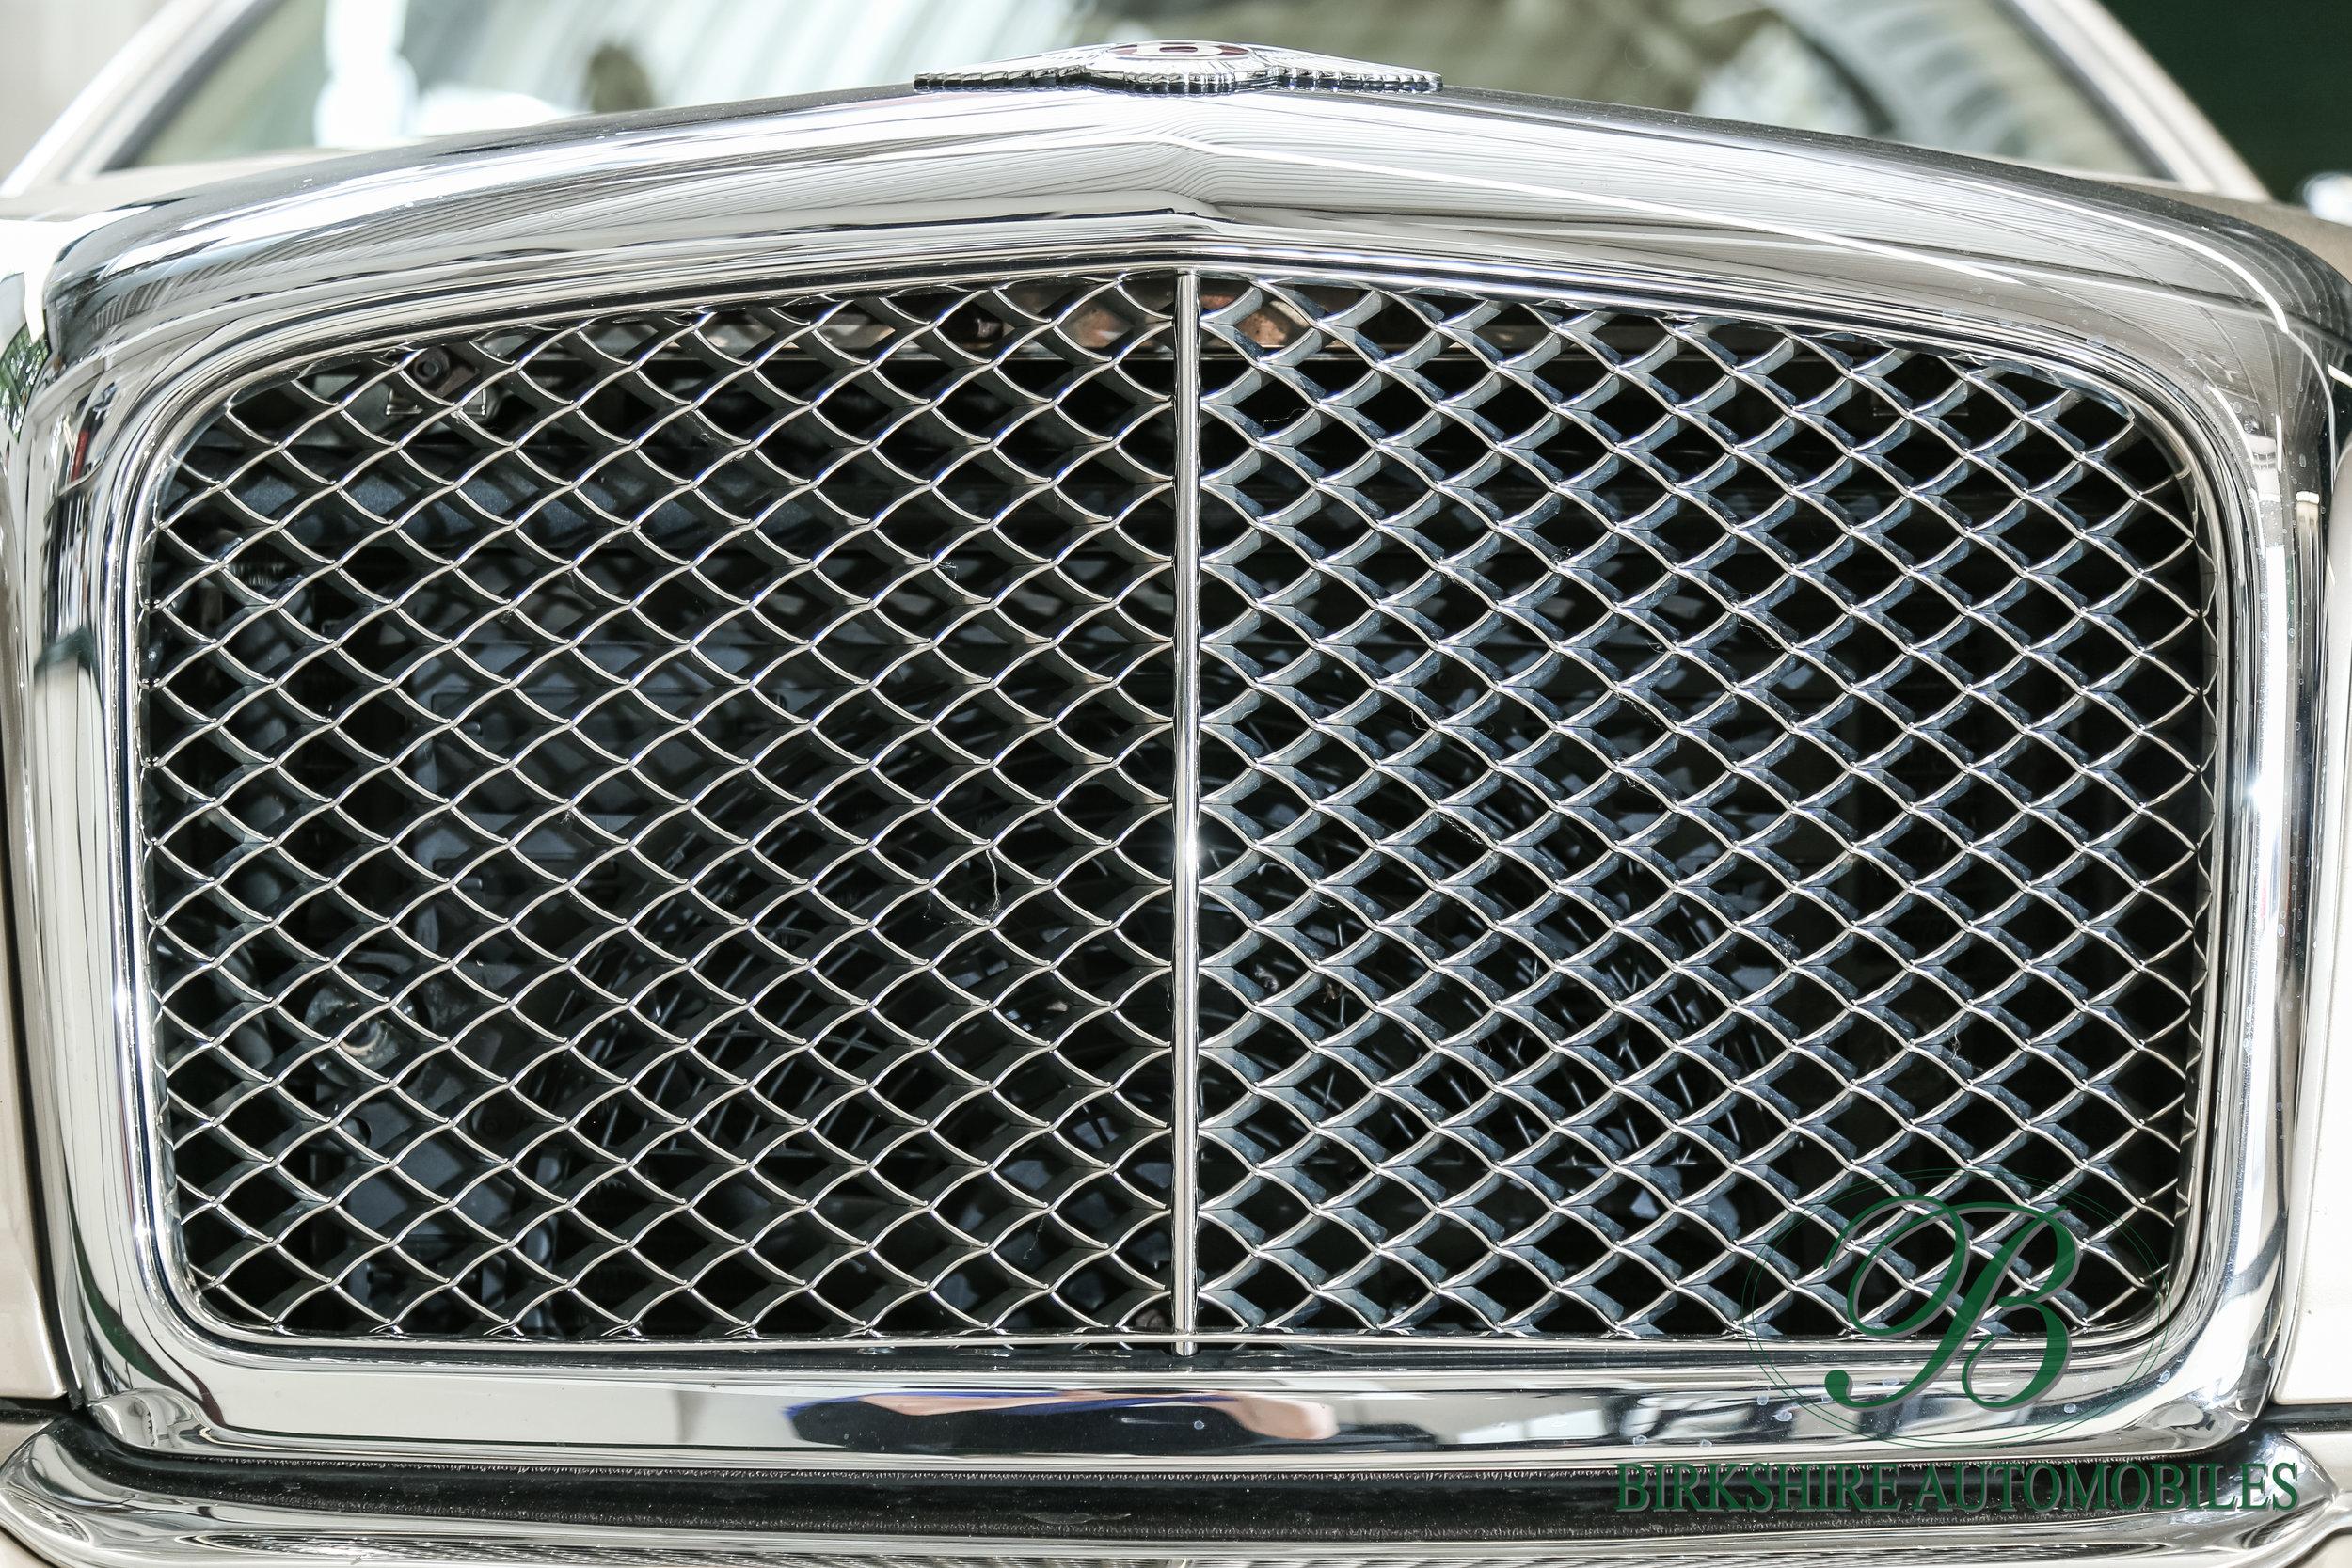 Birkshire Automobiles-326.jpg